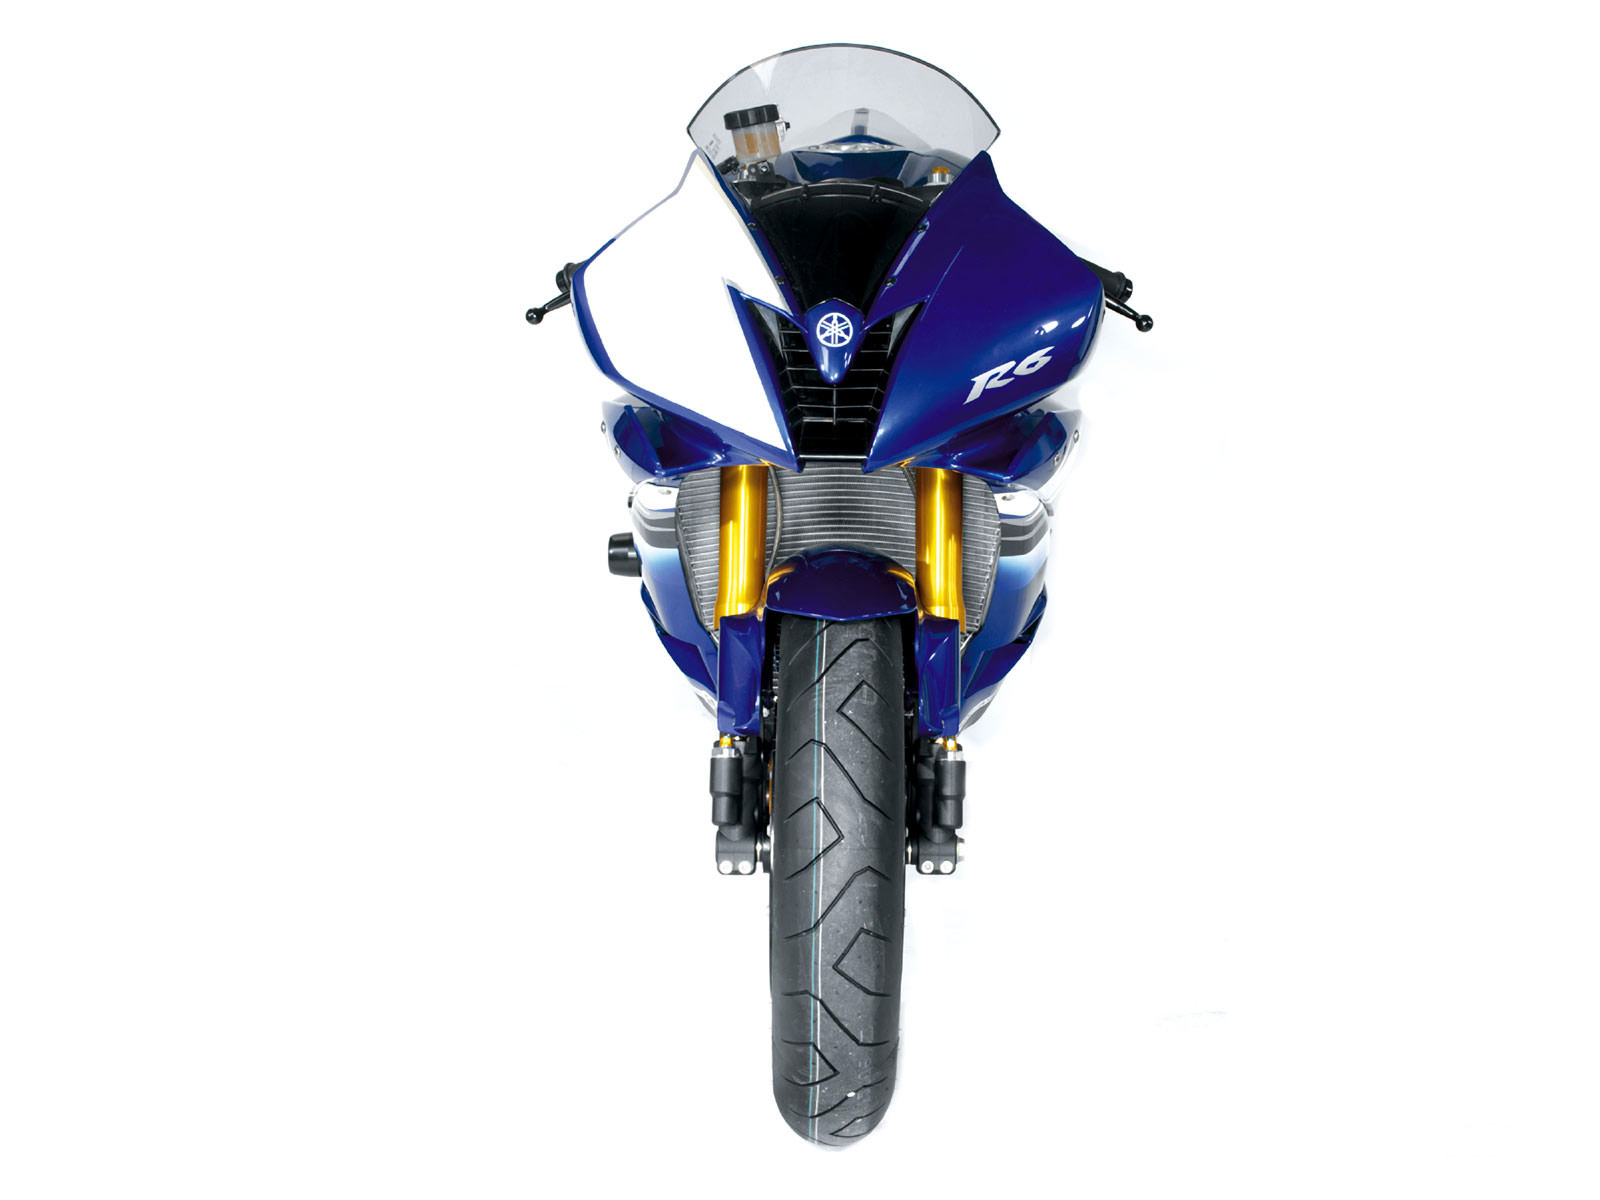 http://1.bp.blogspot.com/-wdlRvw4Kvas/Ts3j3PCb86I/AAAAAAAAEvY/lHQrZdyCvgg/s1600/2006-YAMAHA-YZF-R6-Circuit_motorcycle-desktop-wallpaper_01.jpg